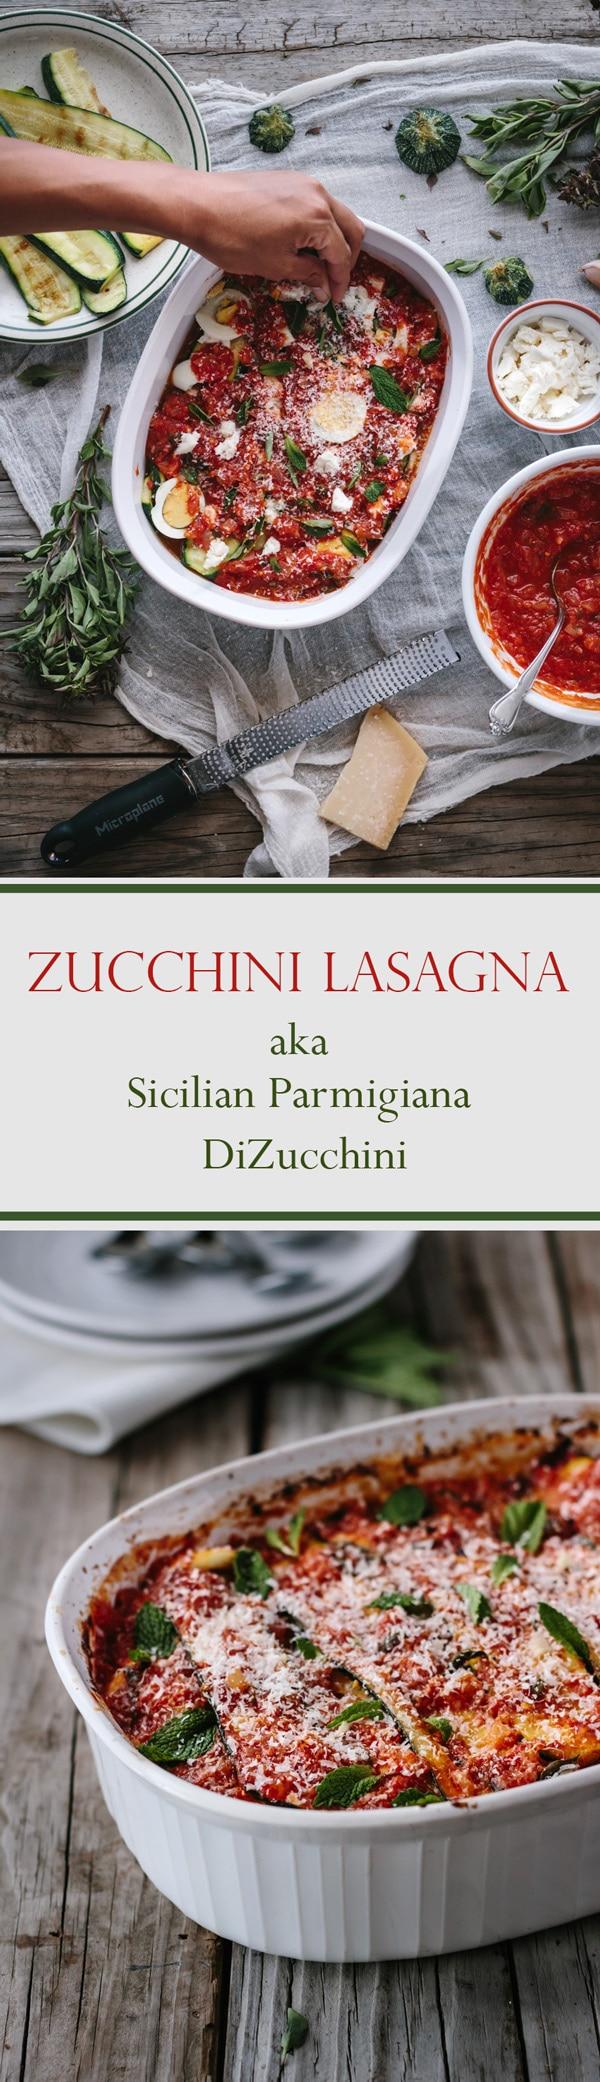 Sicilian Parmigiana DiZucchine